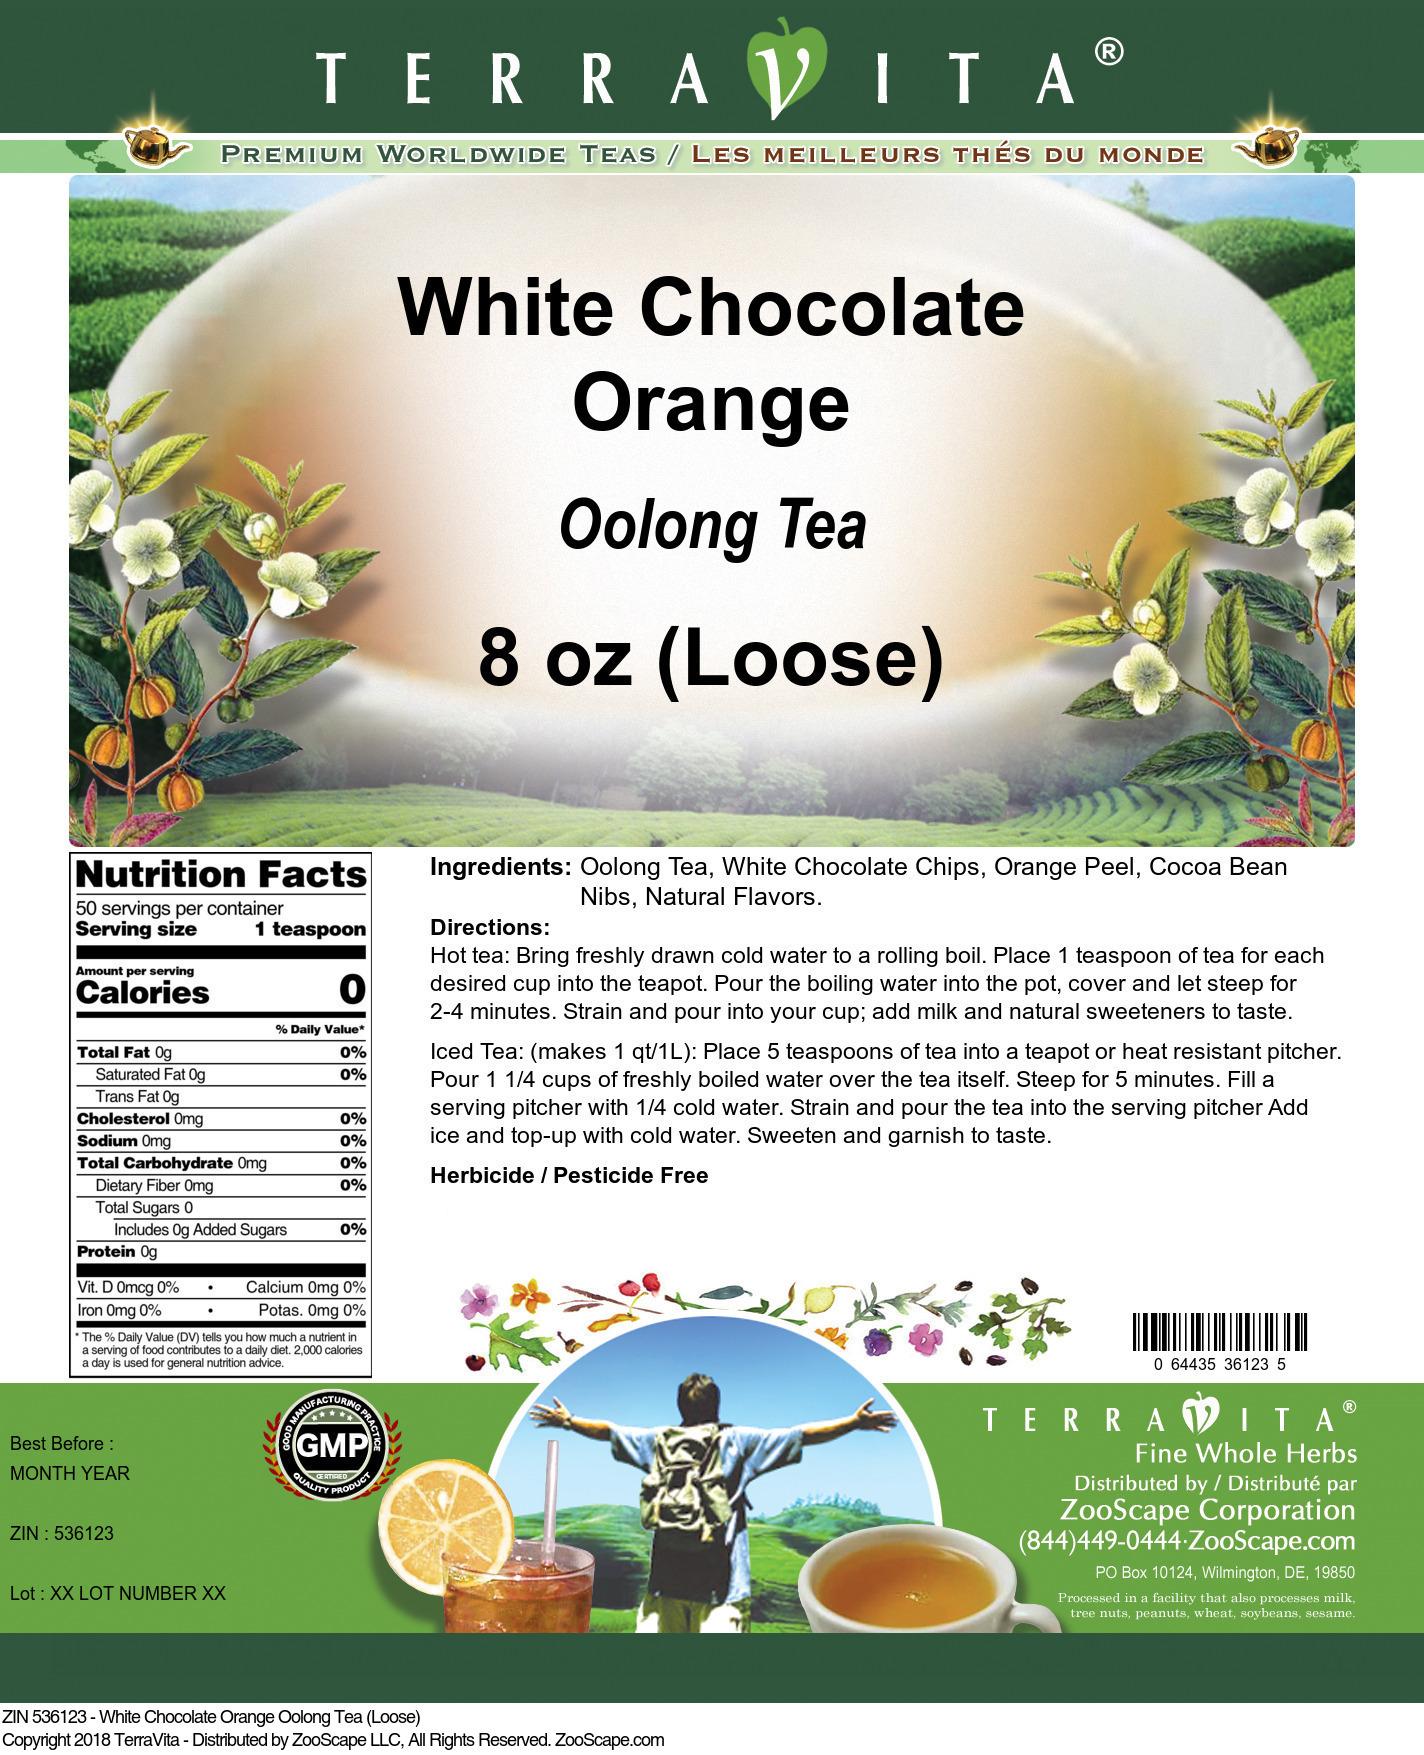 White Chocolate Orange Oolong Tea (Loose)